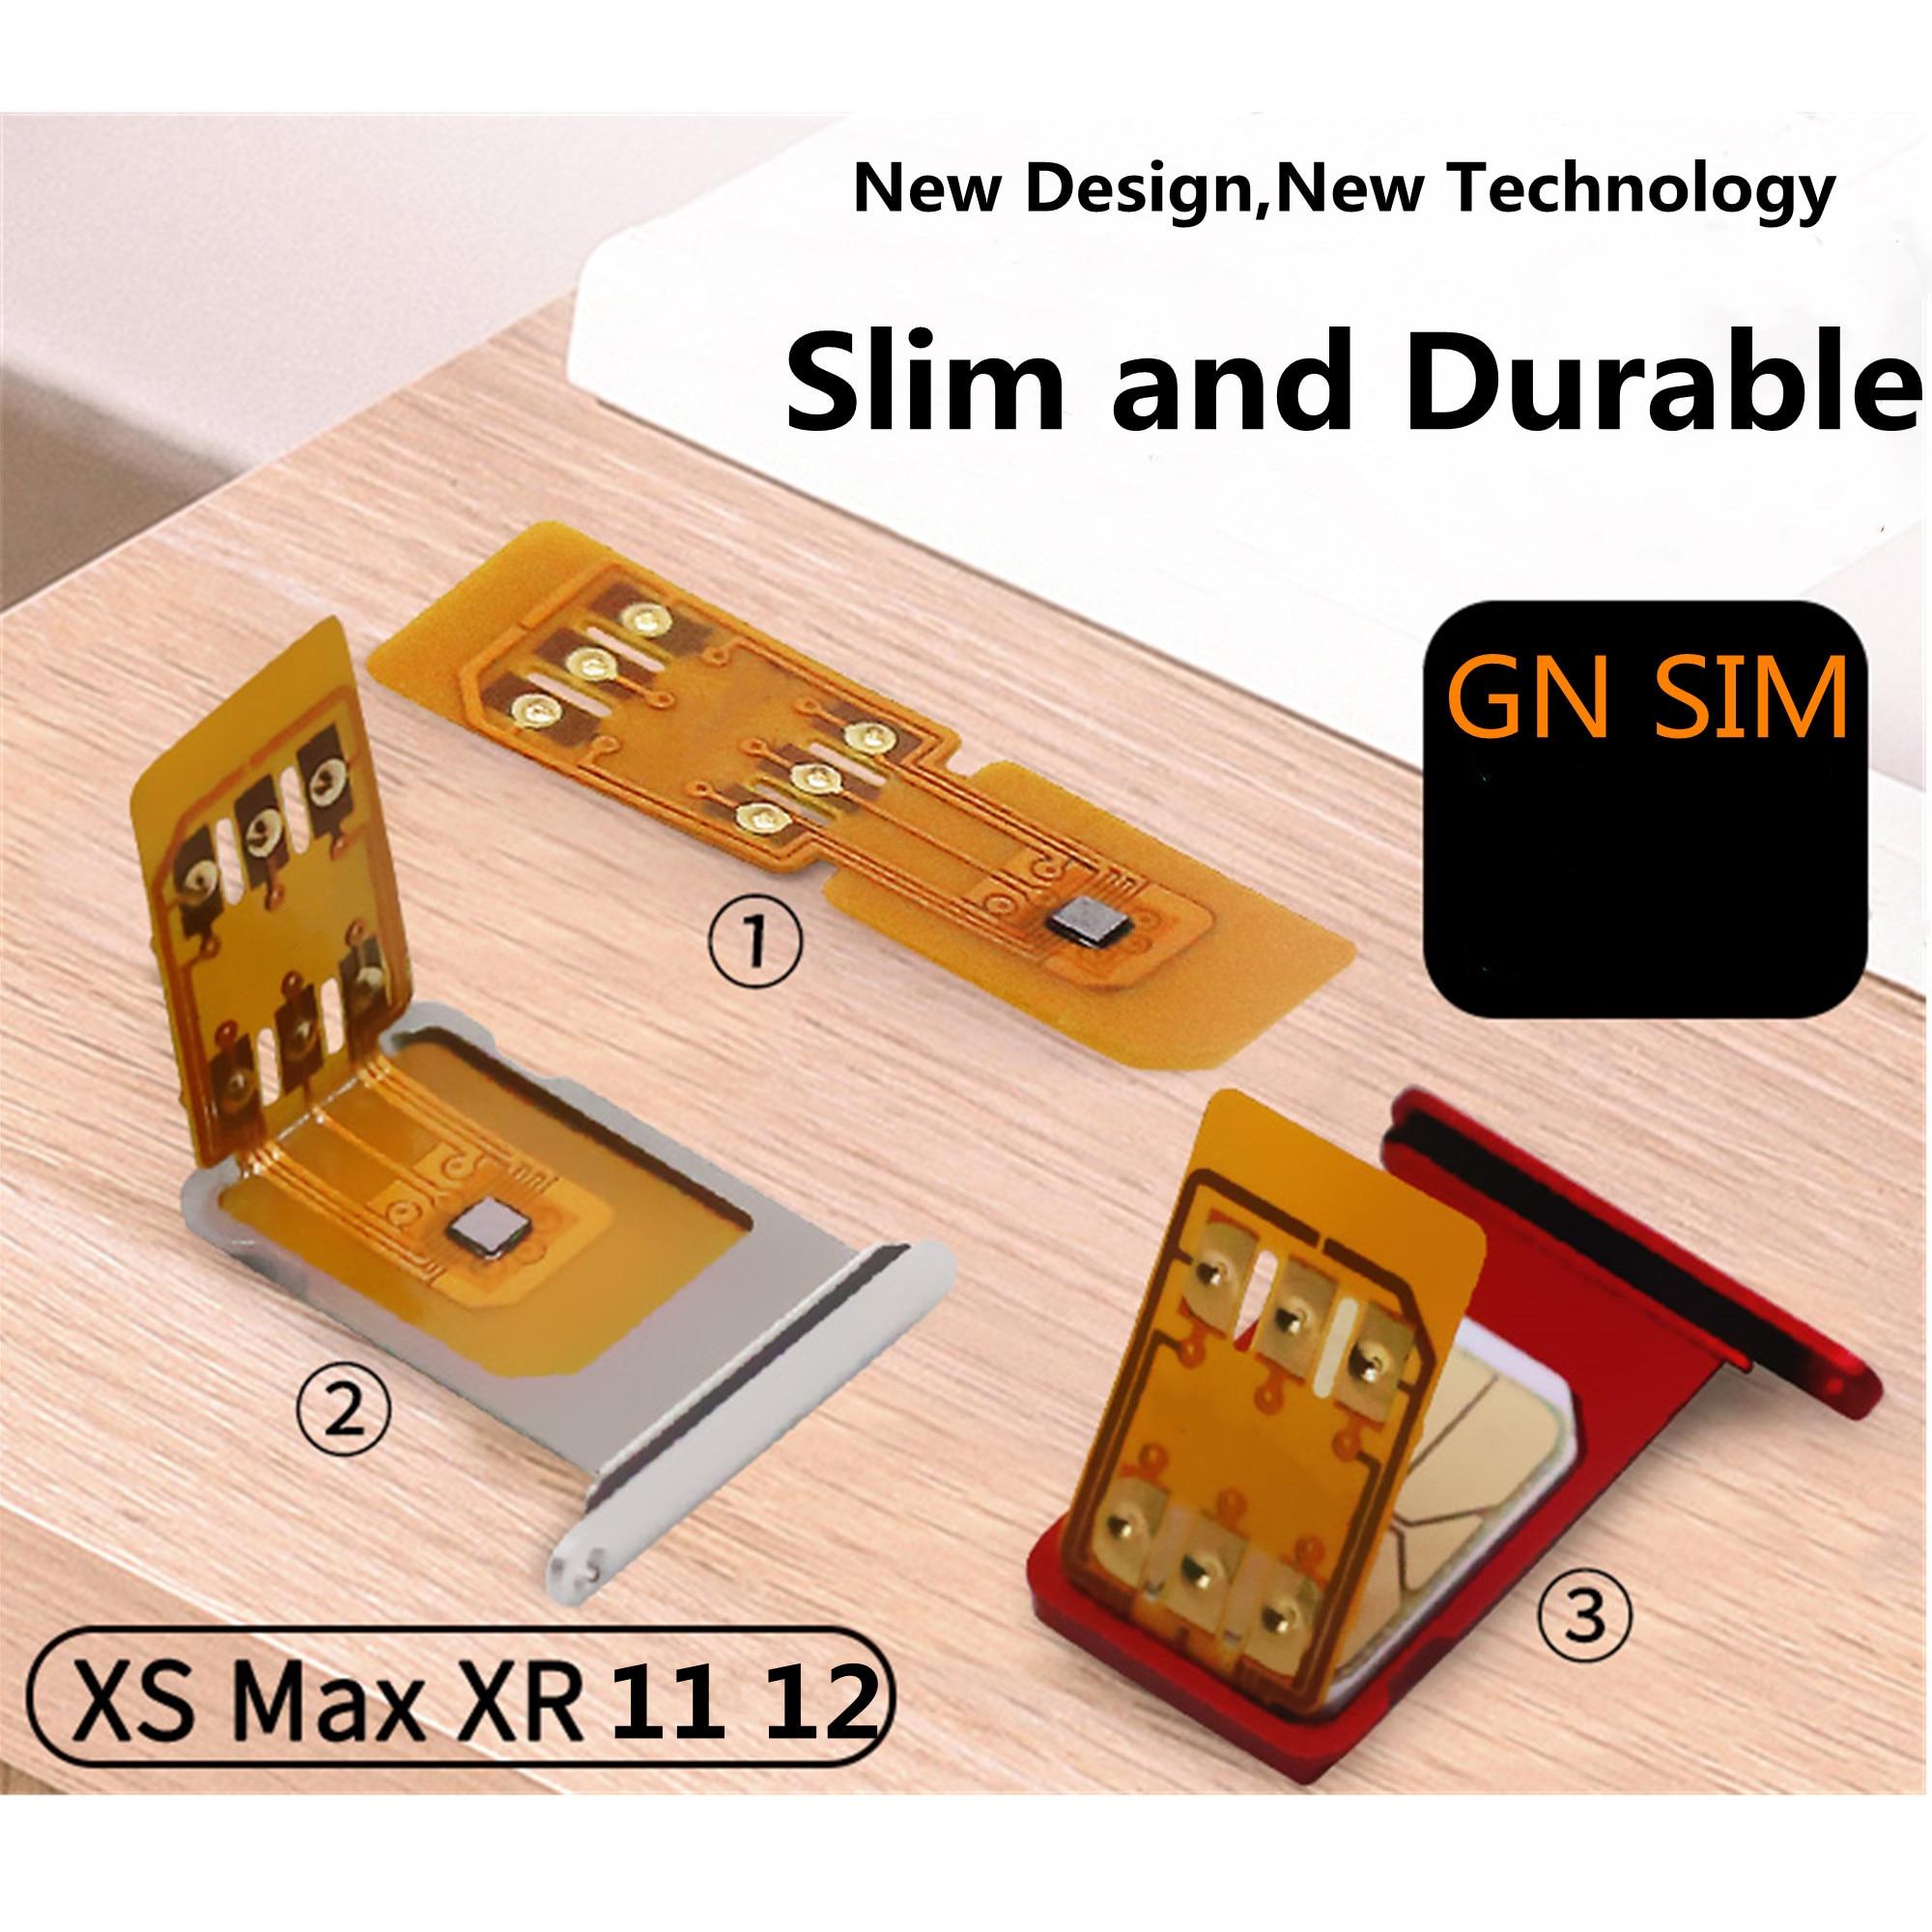 20 PCS Foldable Chip 10 Single Chip 15 White SIM GN SIM Unlock Chip  For IP XS XR 11 12 IOS 14.x Durable Sim Unlock  ICCID enlarge